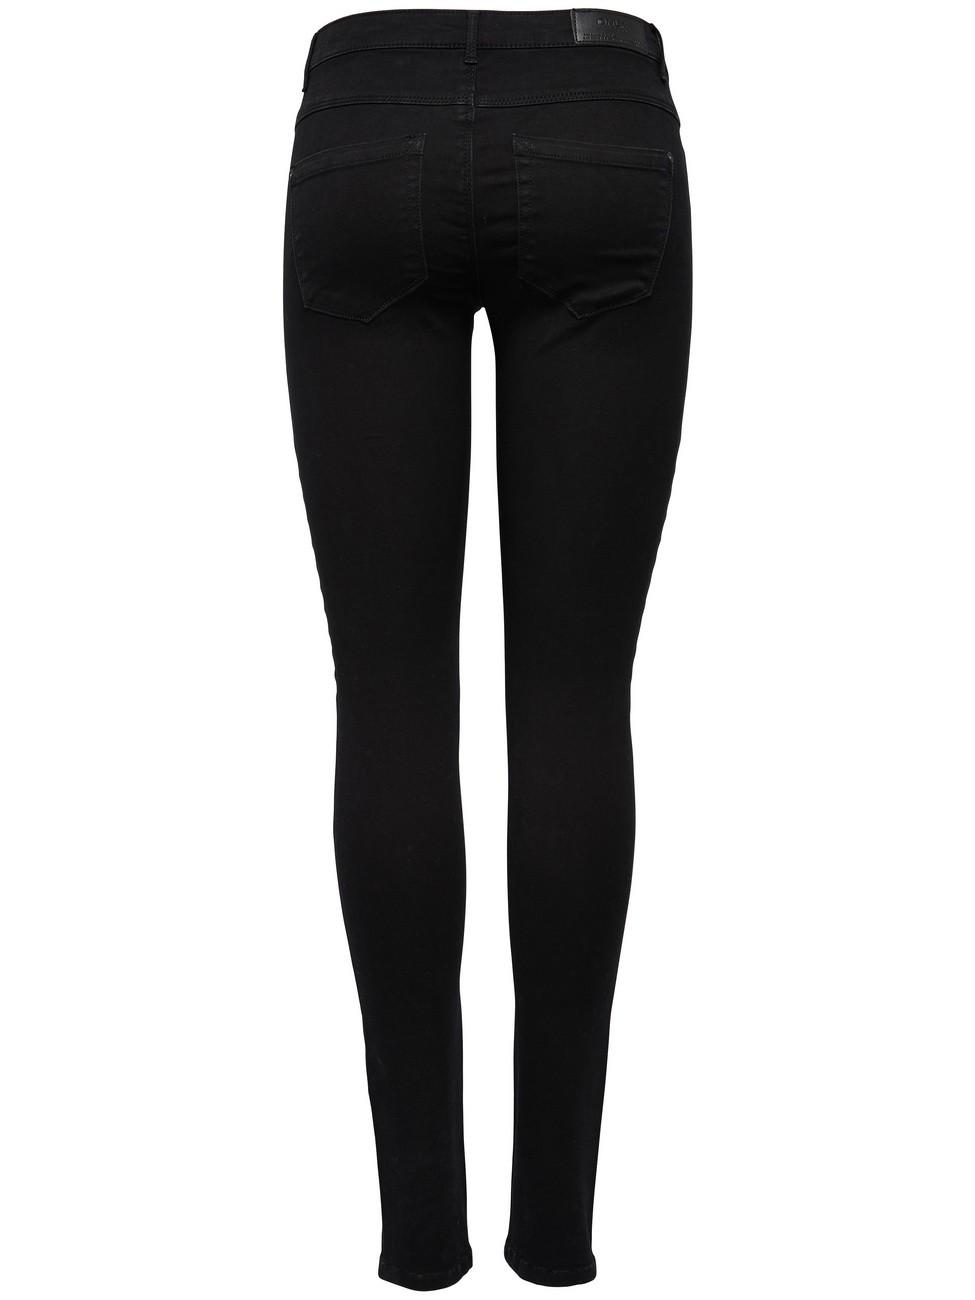 only damen biker jeans onlroyal schwarz kaufen jeans direct de. Black Bedroom Furniture Sets. Home Design Ideas